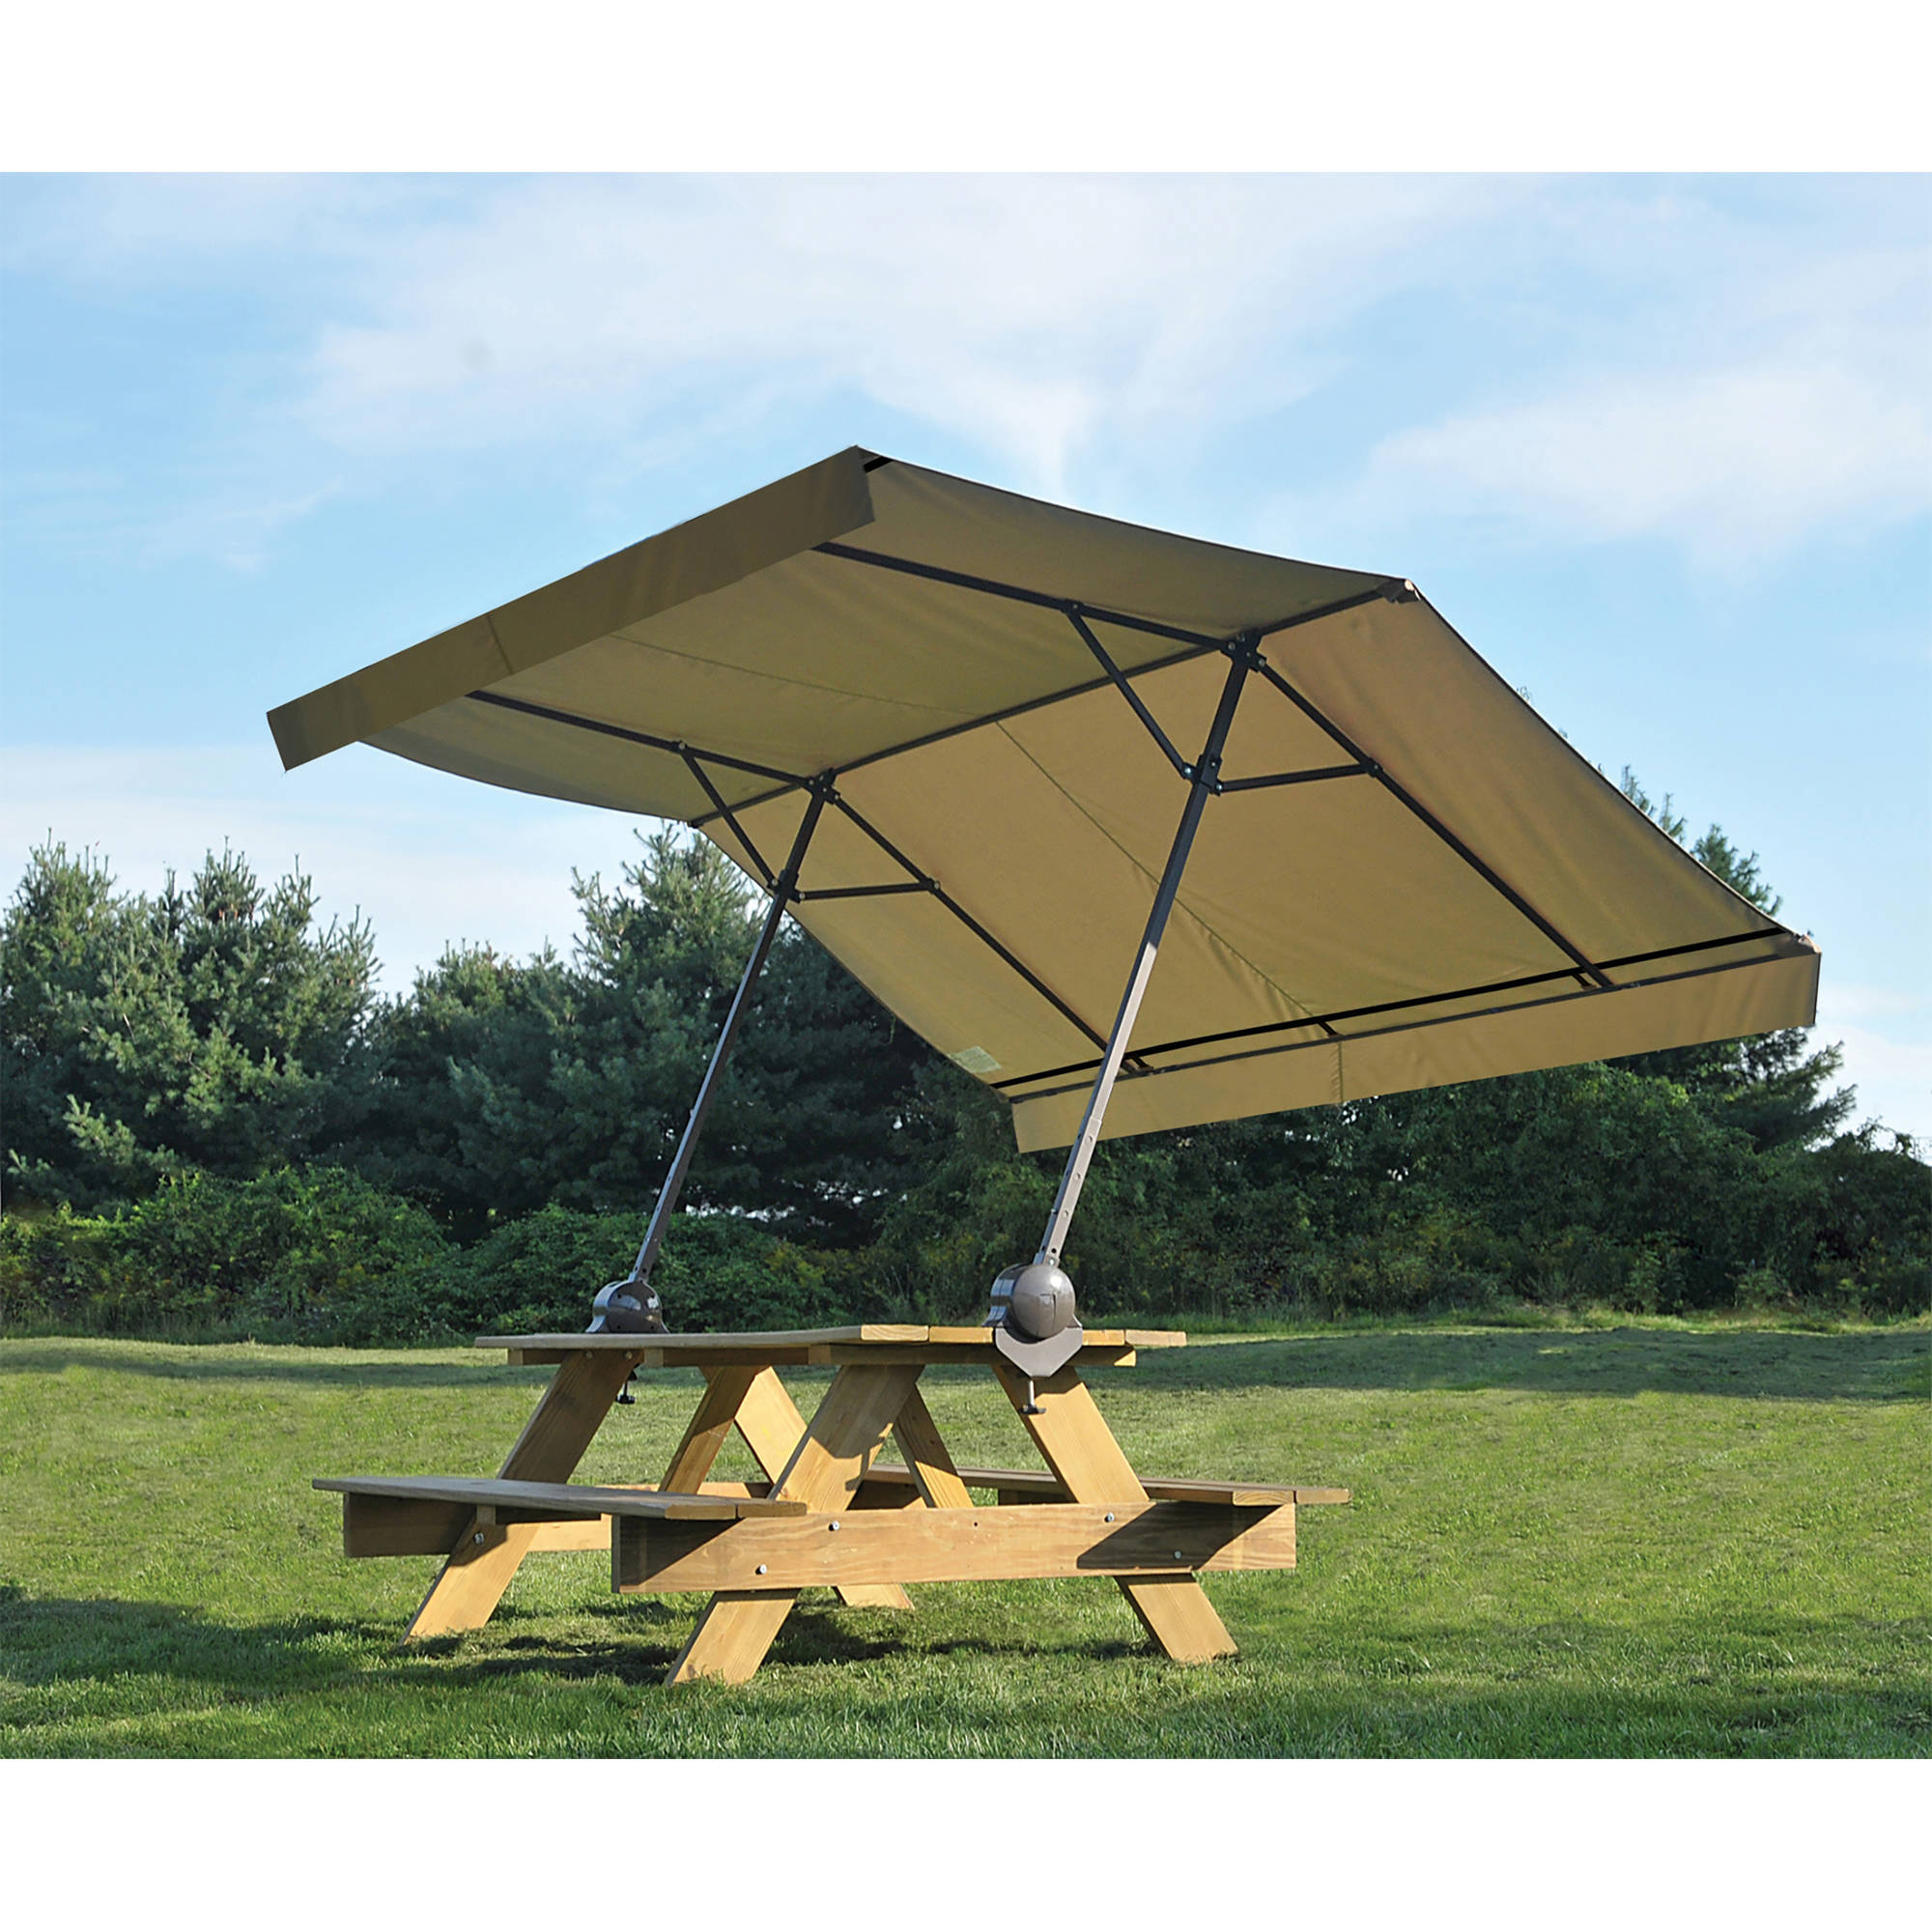 shadelogic quick clamp canopy tilt mount, 10'/3m - walmart